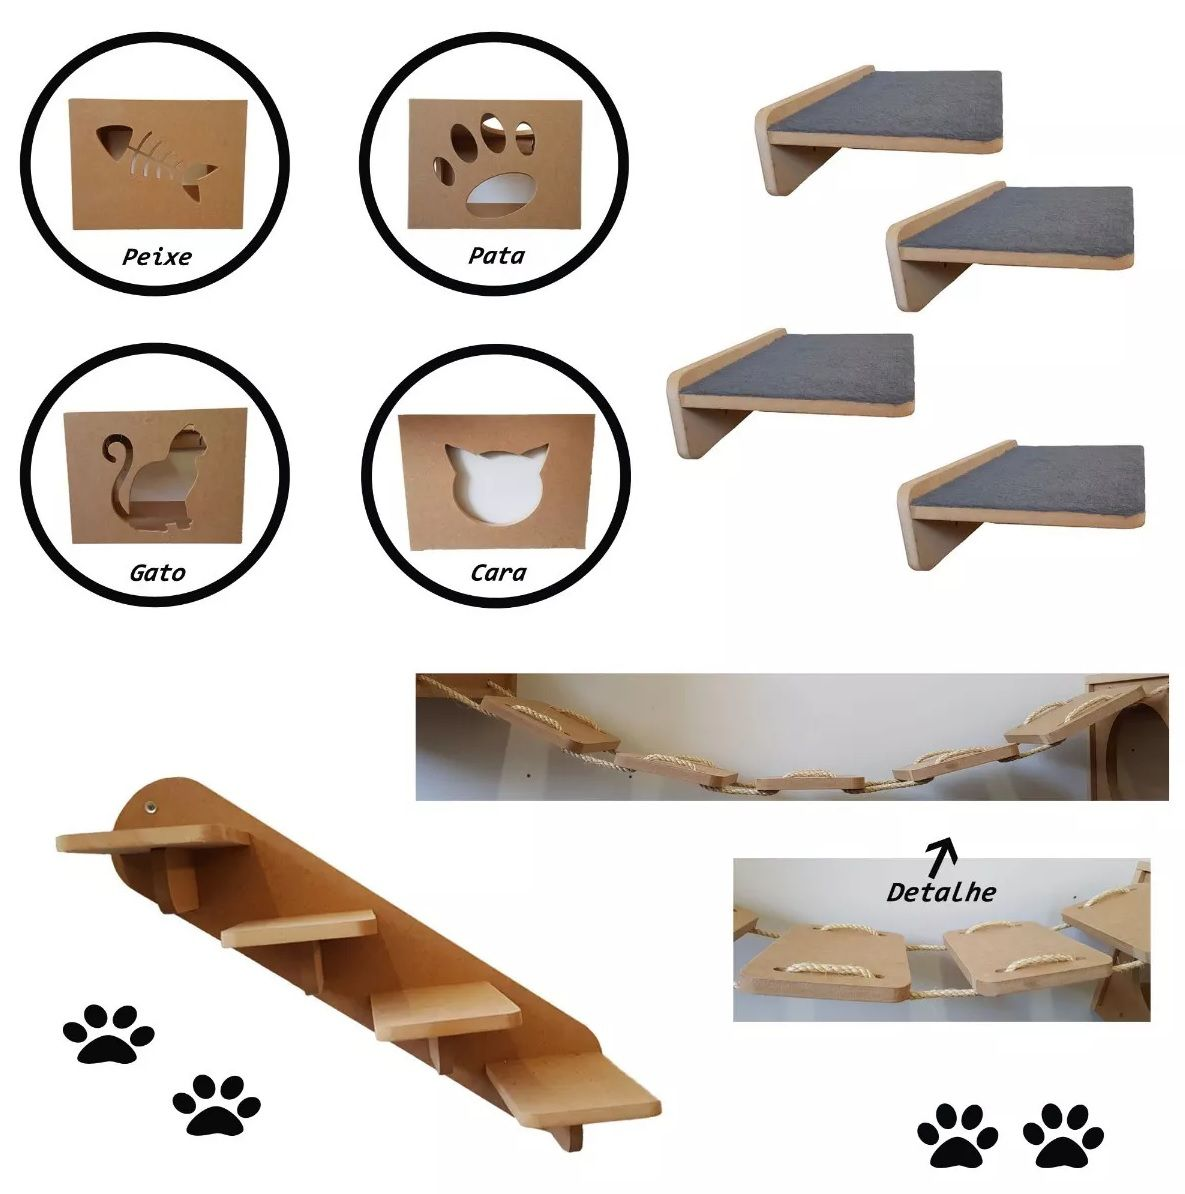 Kit 13pçs= 4 Nichos + 4 Prateleiras + 2 Escadas + 3 Pontes p/  Gato Mdf 15mm